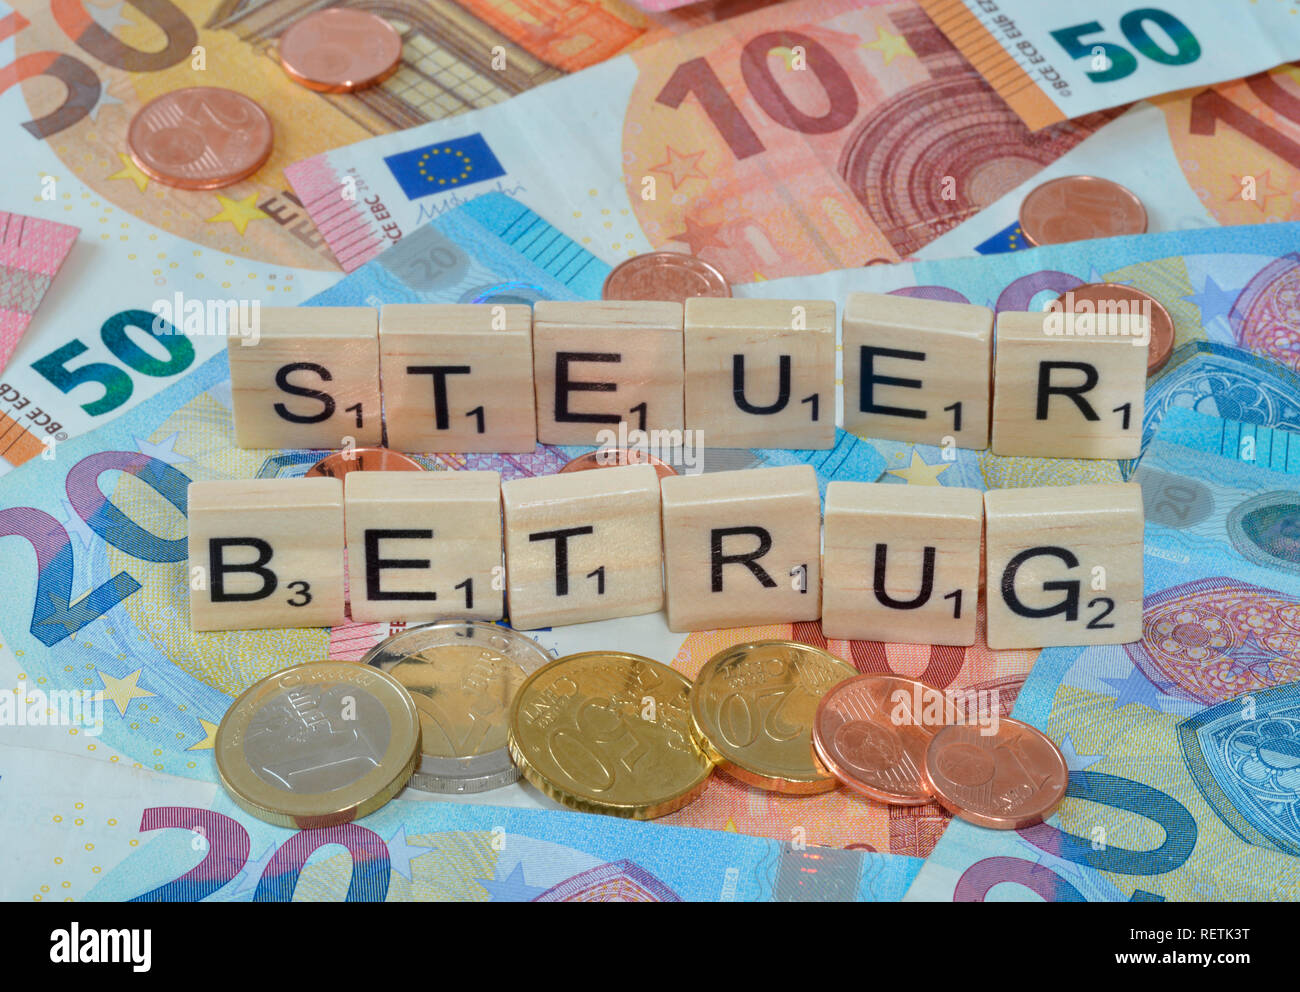 El fraude fiscal Imagen De Stock